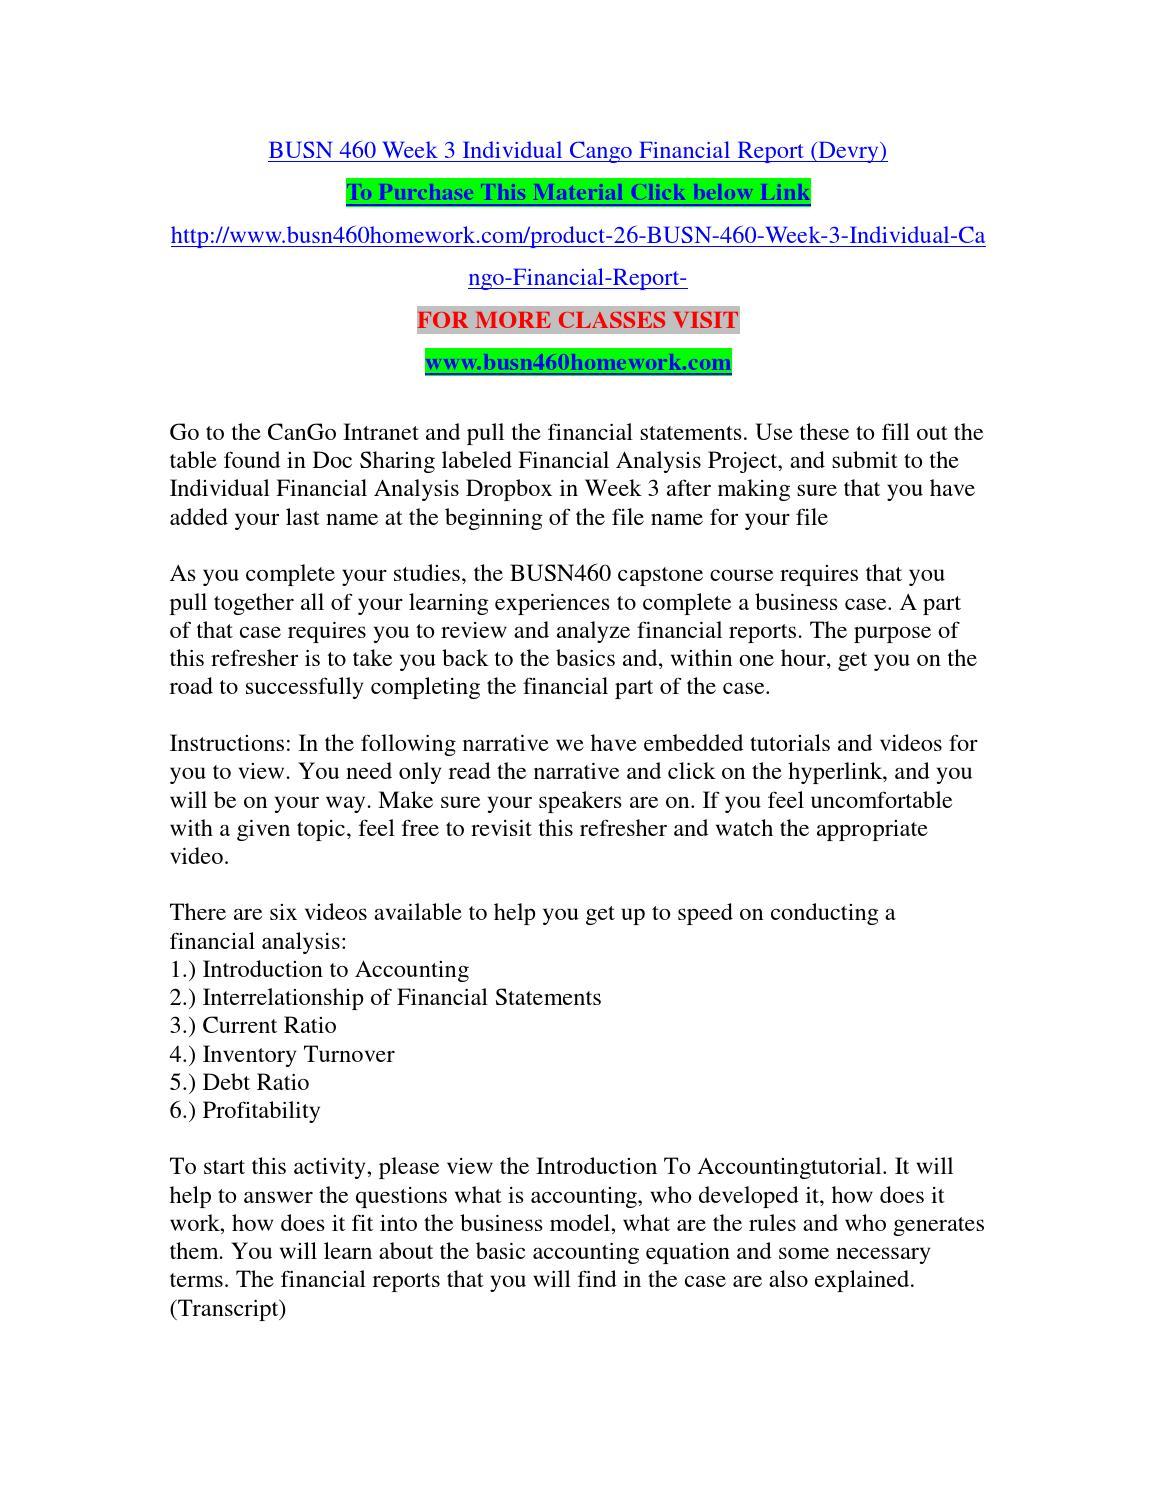 BUSN460 - Week 3 - Individual Financial Analysis Report - CanGo, Inc